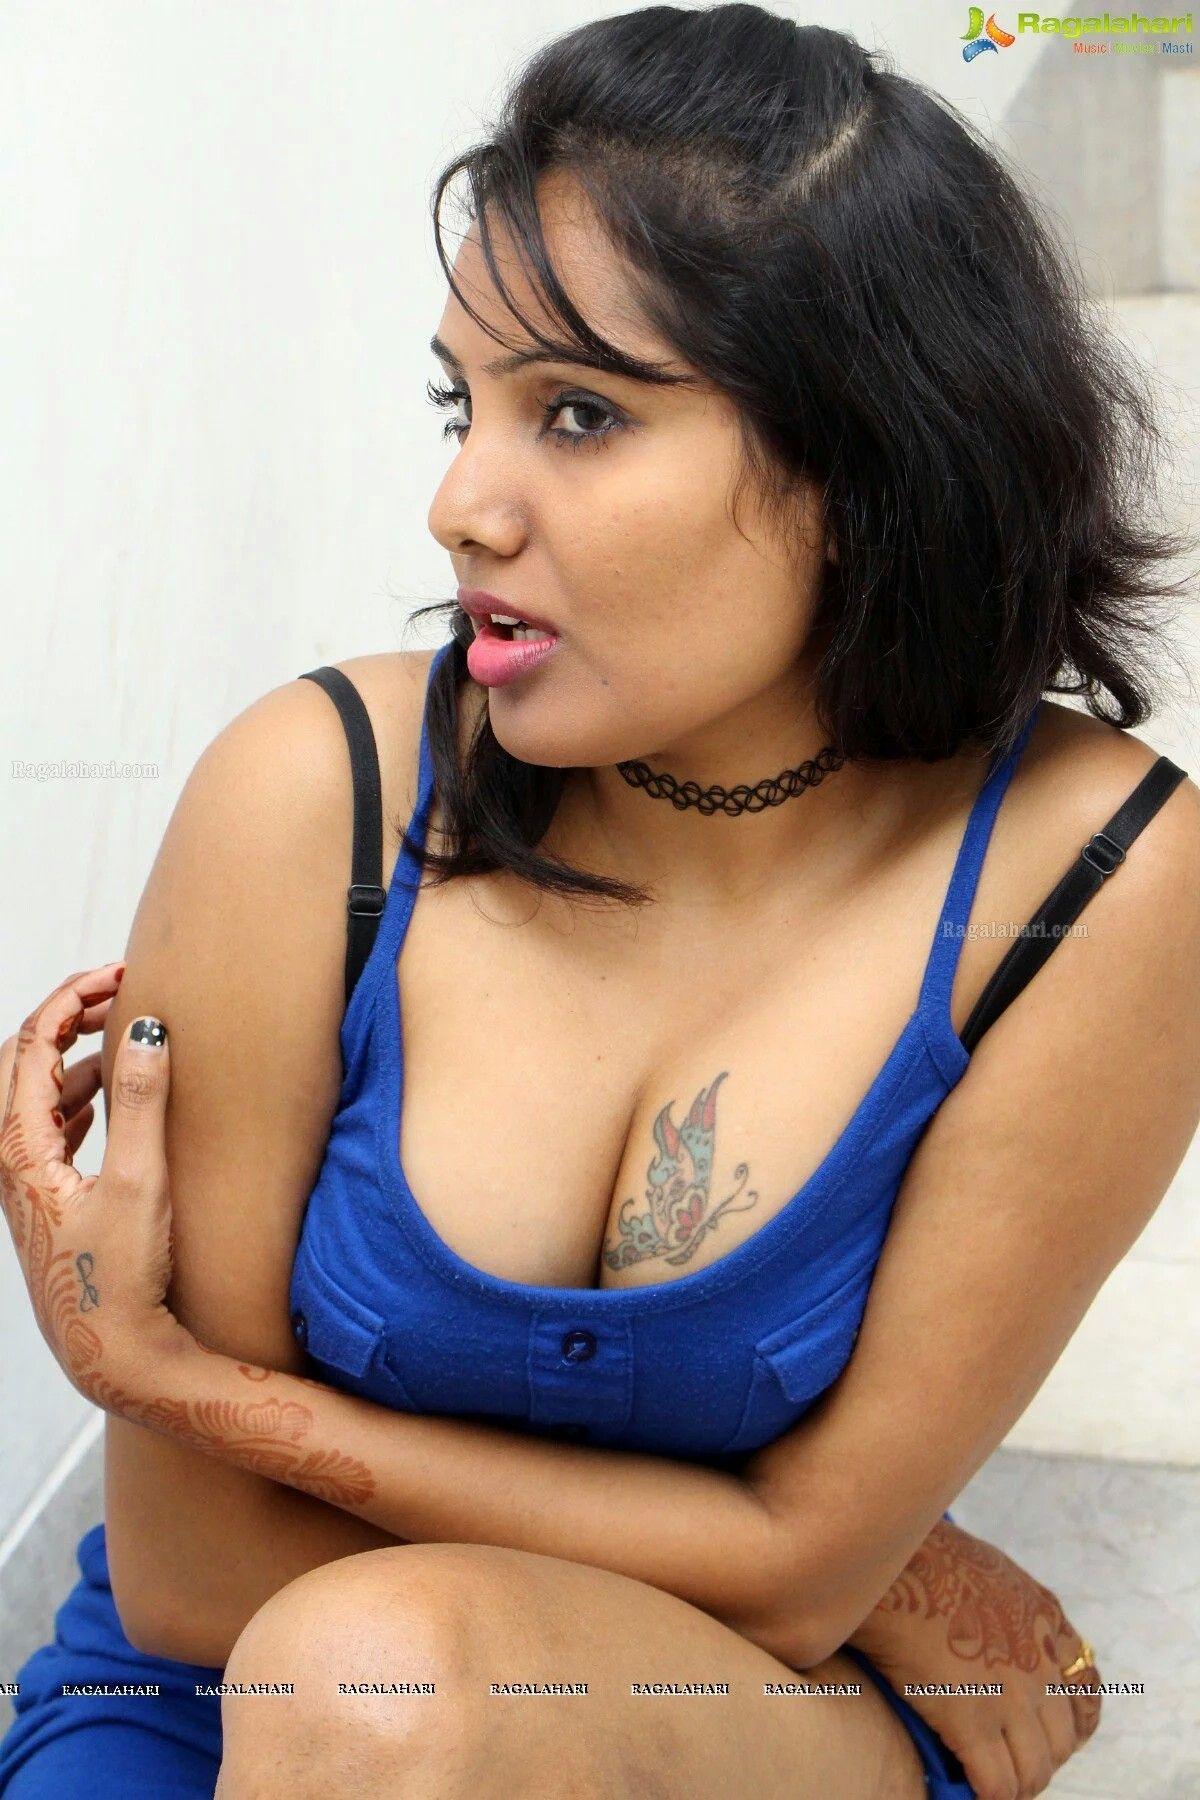 Cleavage India Westbrooks nude photos 2019